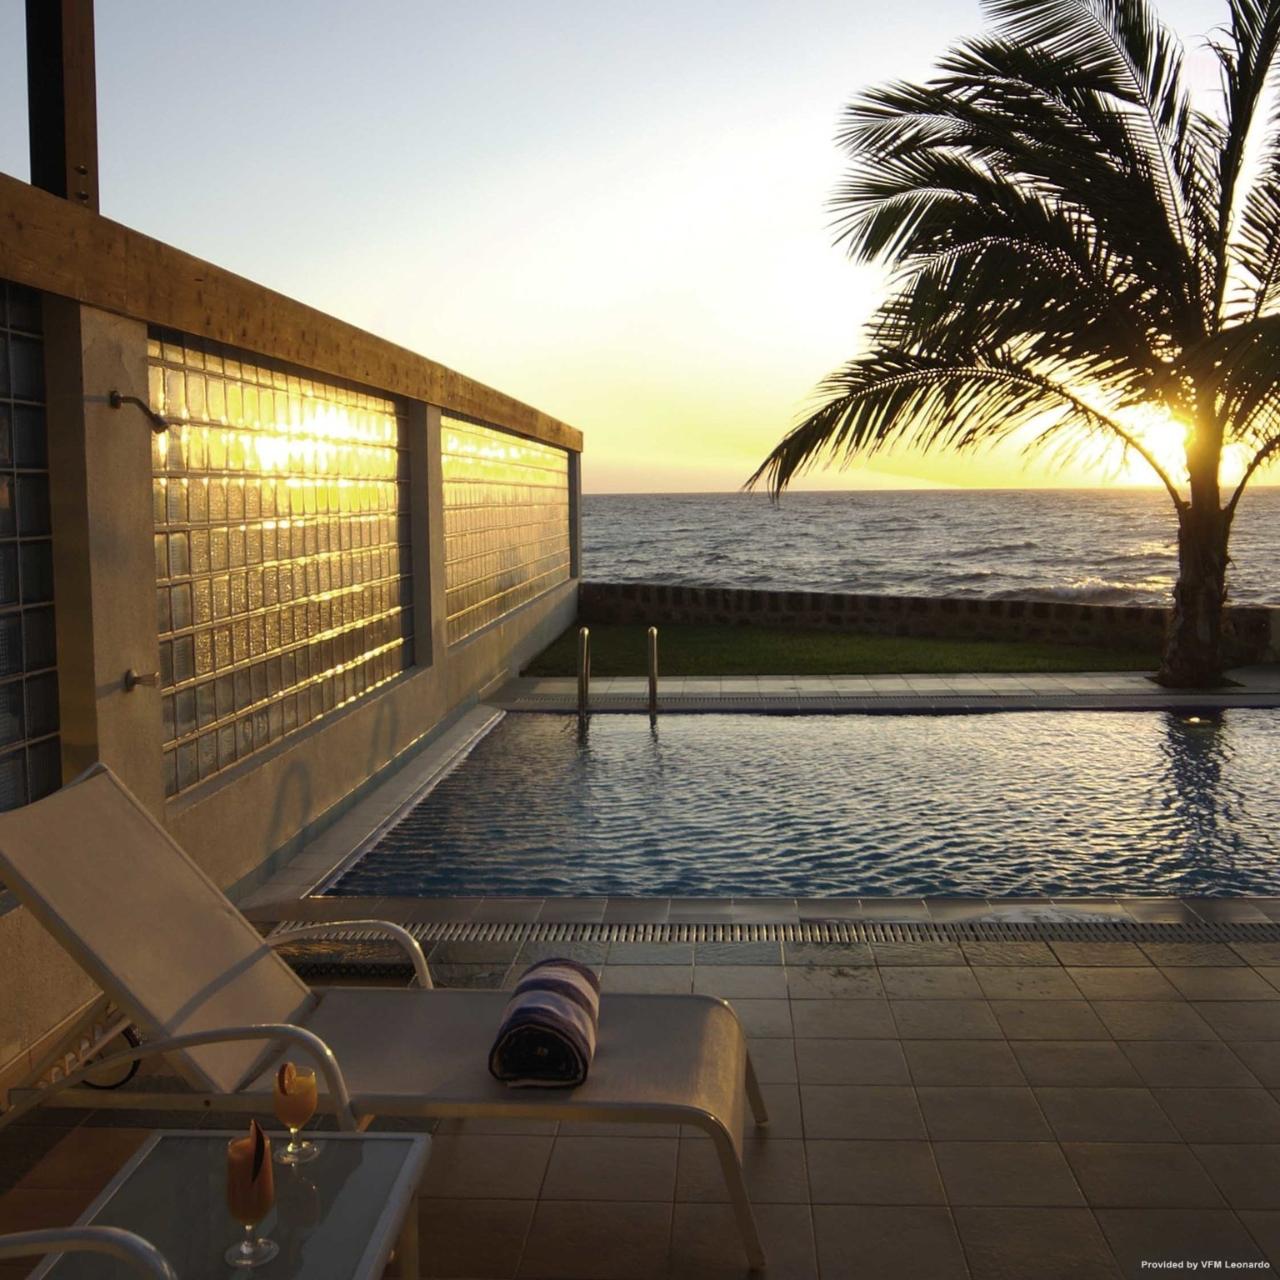 Hotel Movenpick Resort Al Nawras Jeddah Saudi Arabia At Hrs With Free Services